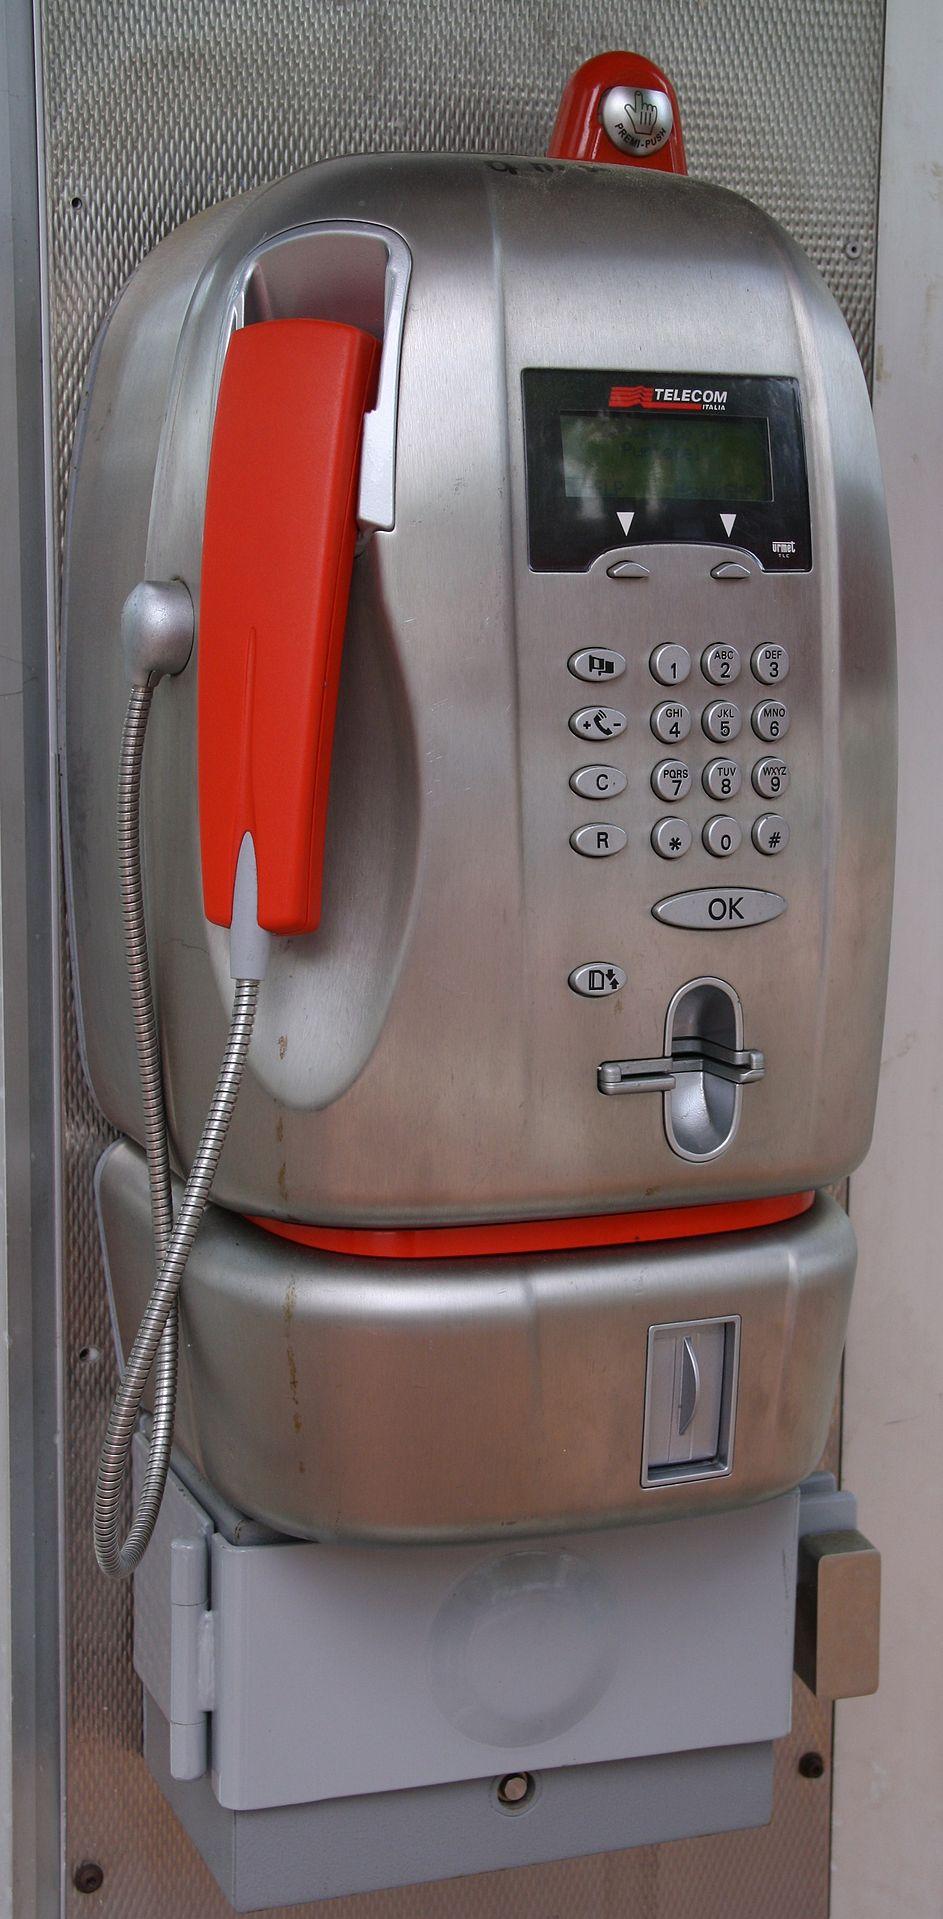 Salvate l'ultima cabina telefonica (di Francesco Giorgioni)